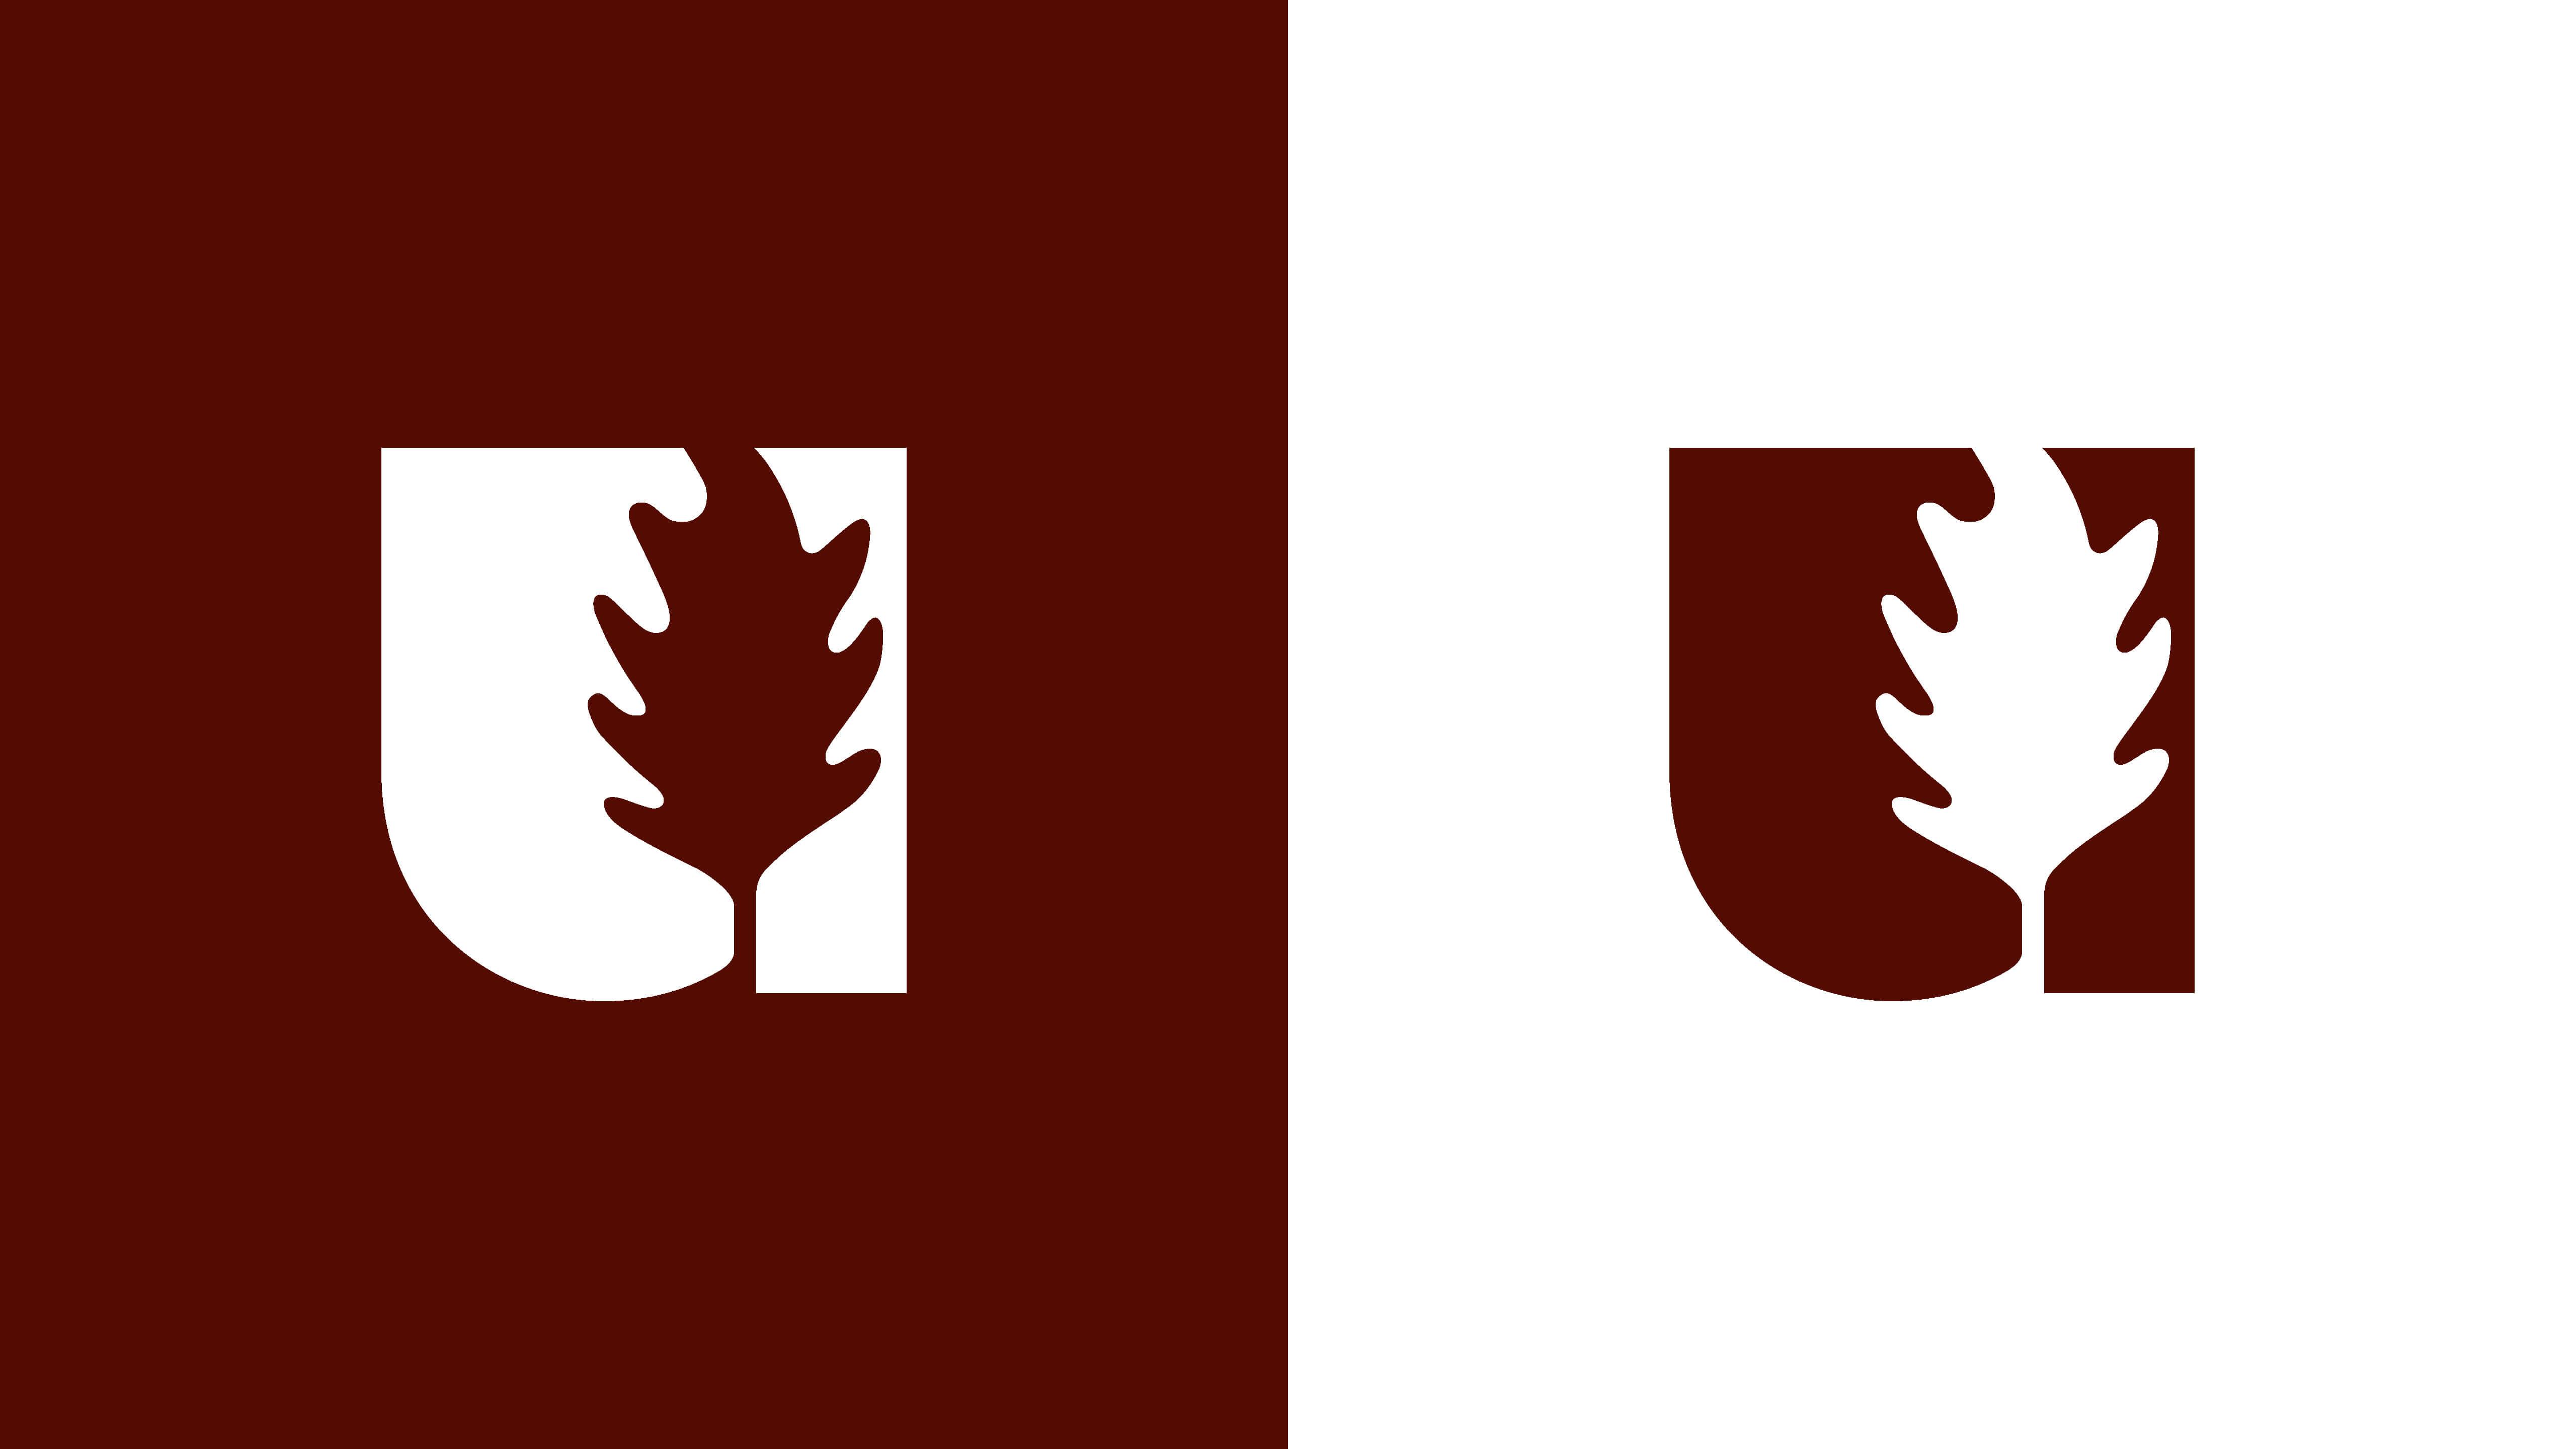 City of Urbana, Illinois - Rebrand